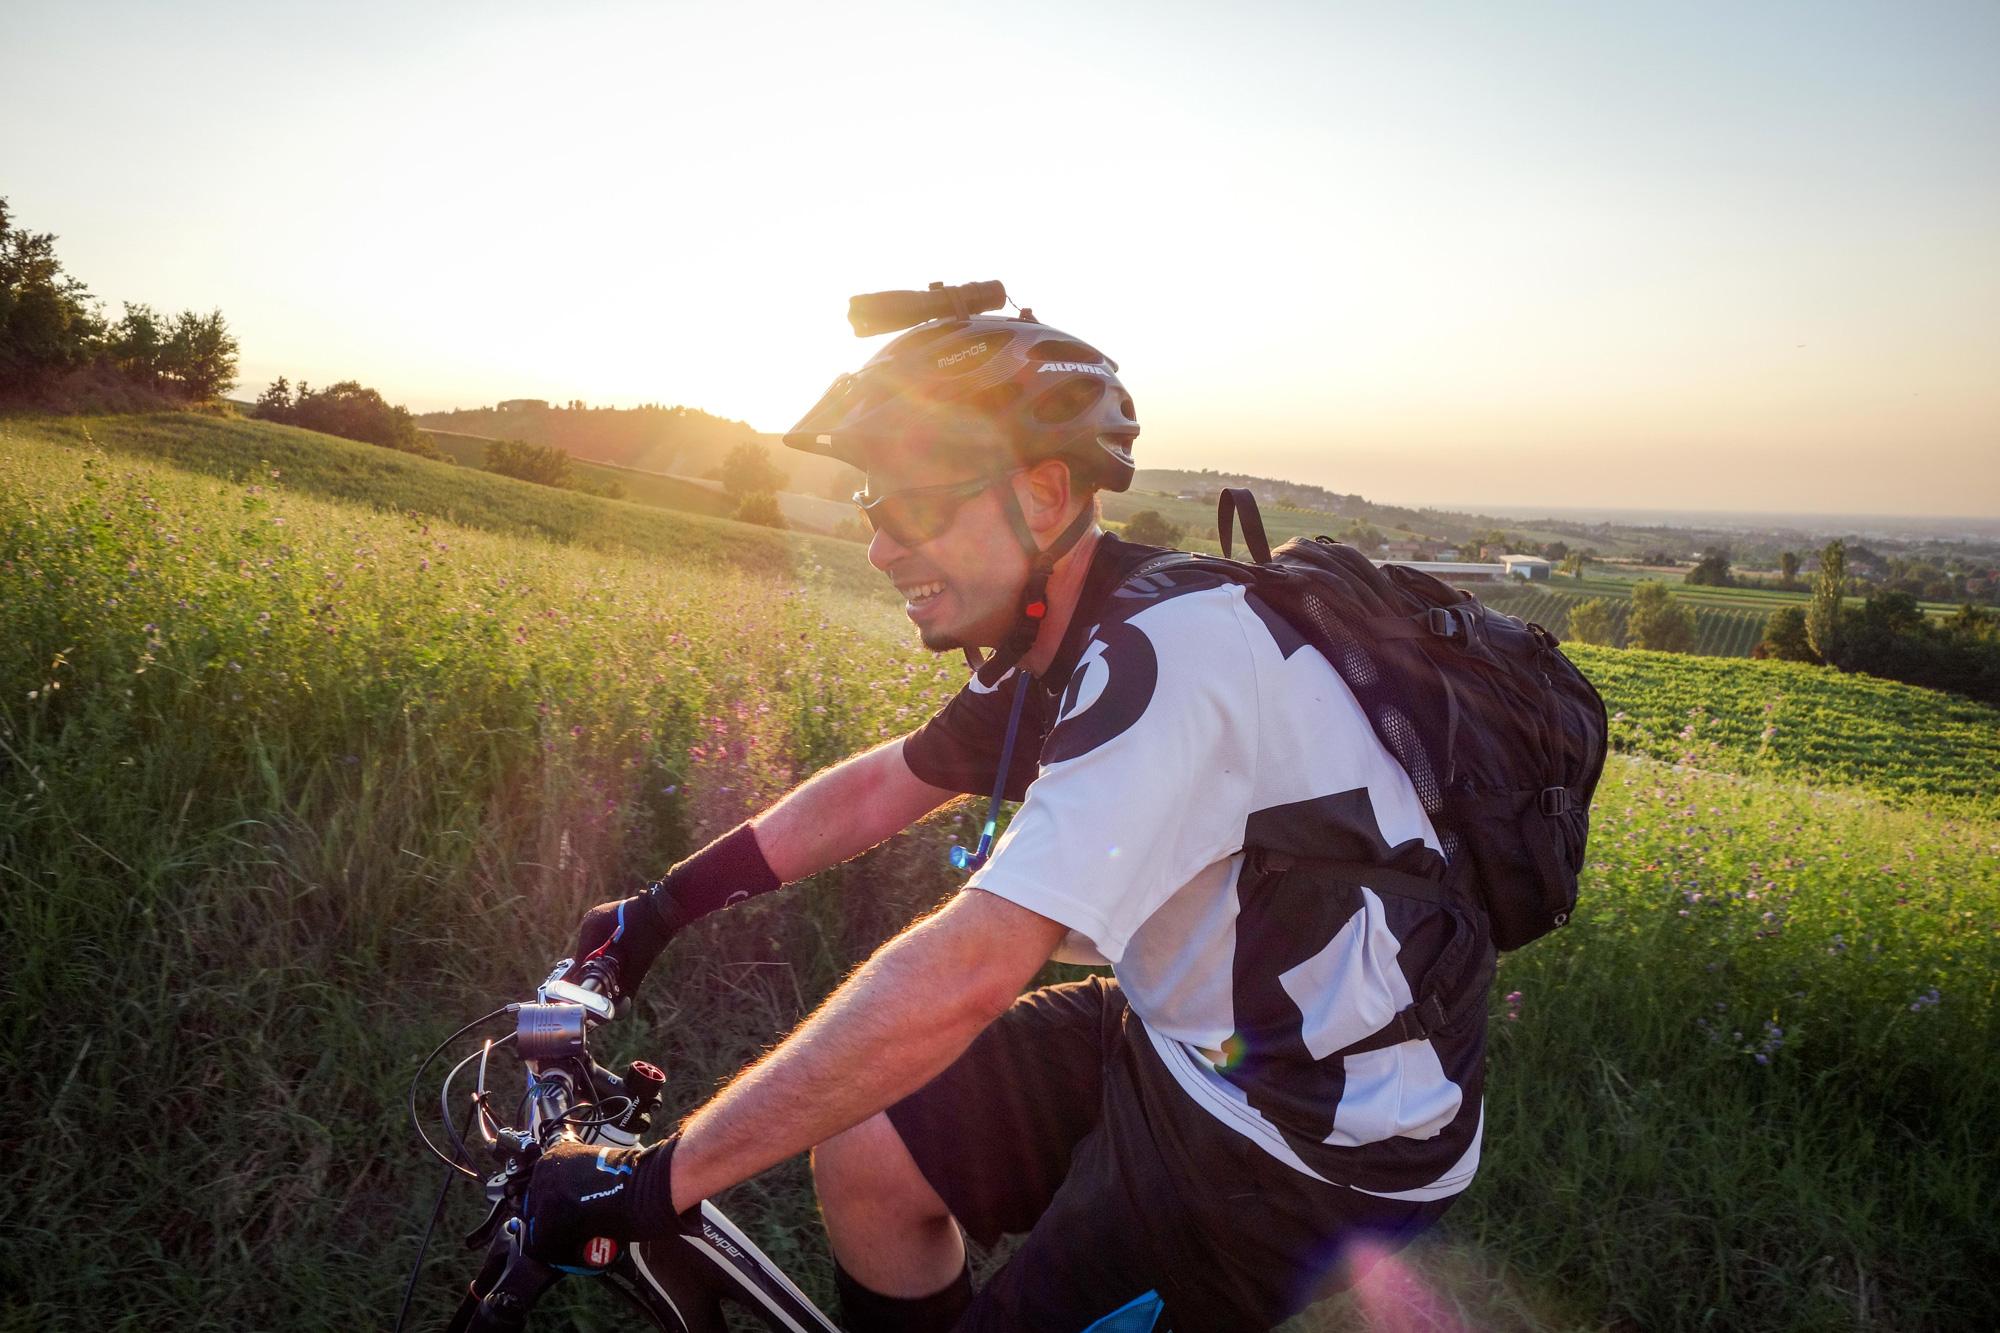 night_ride_bikkenbeers_erman_bike-7